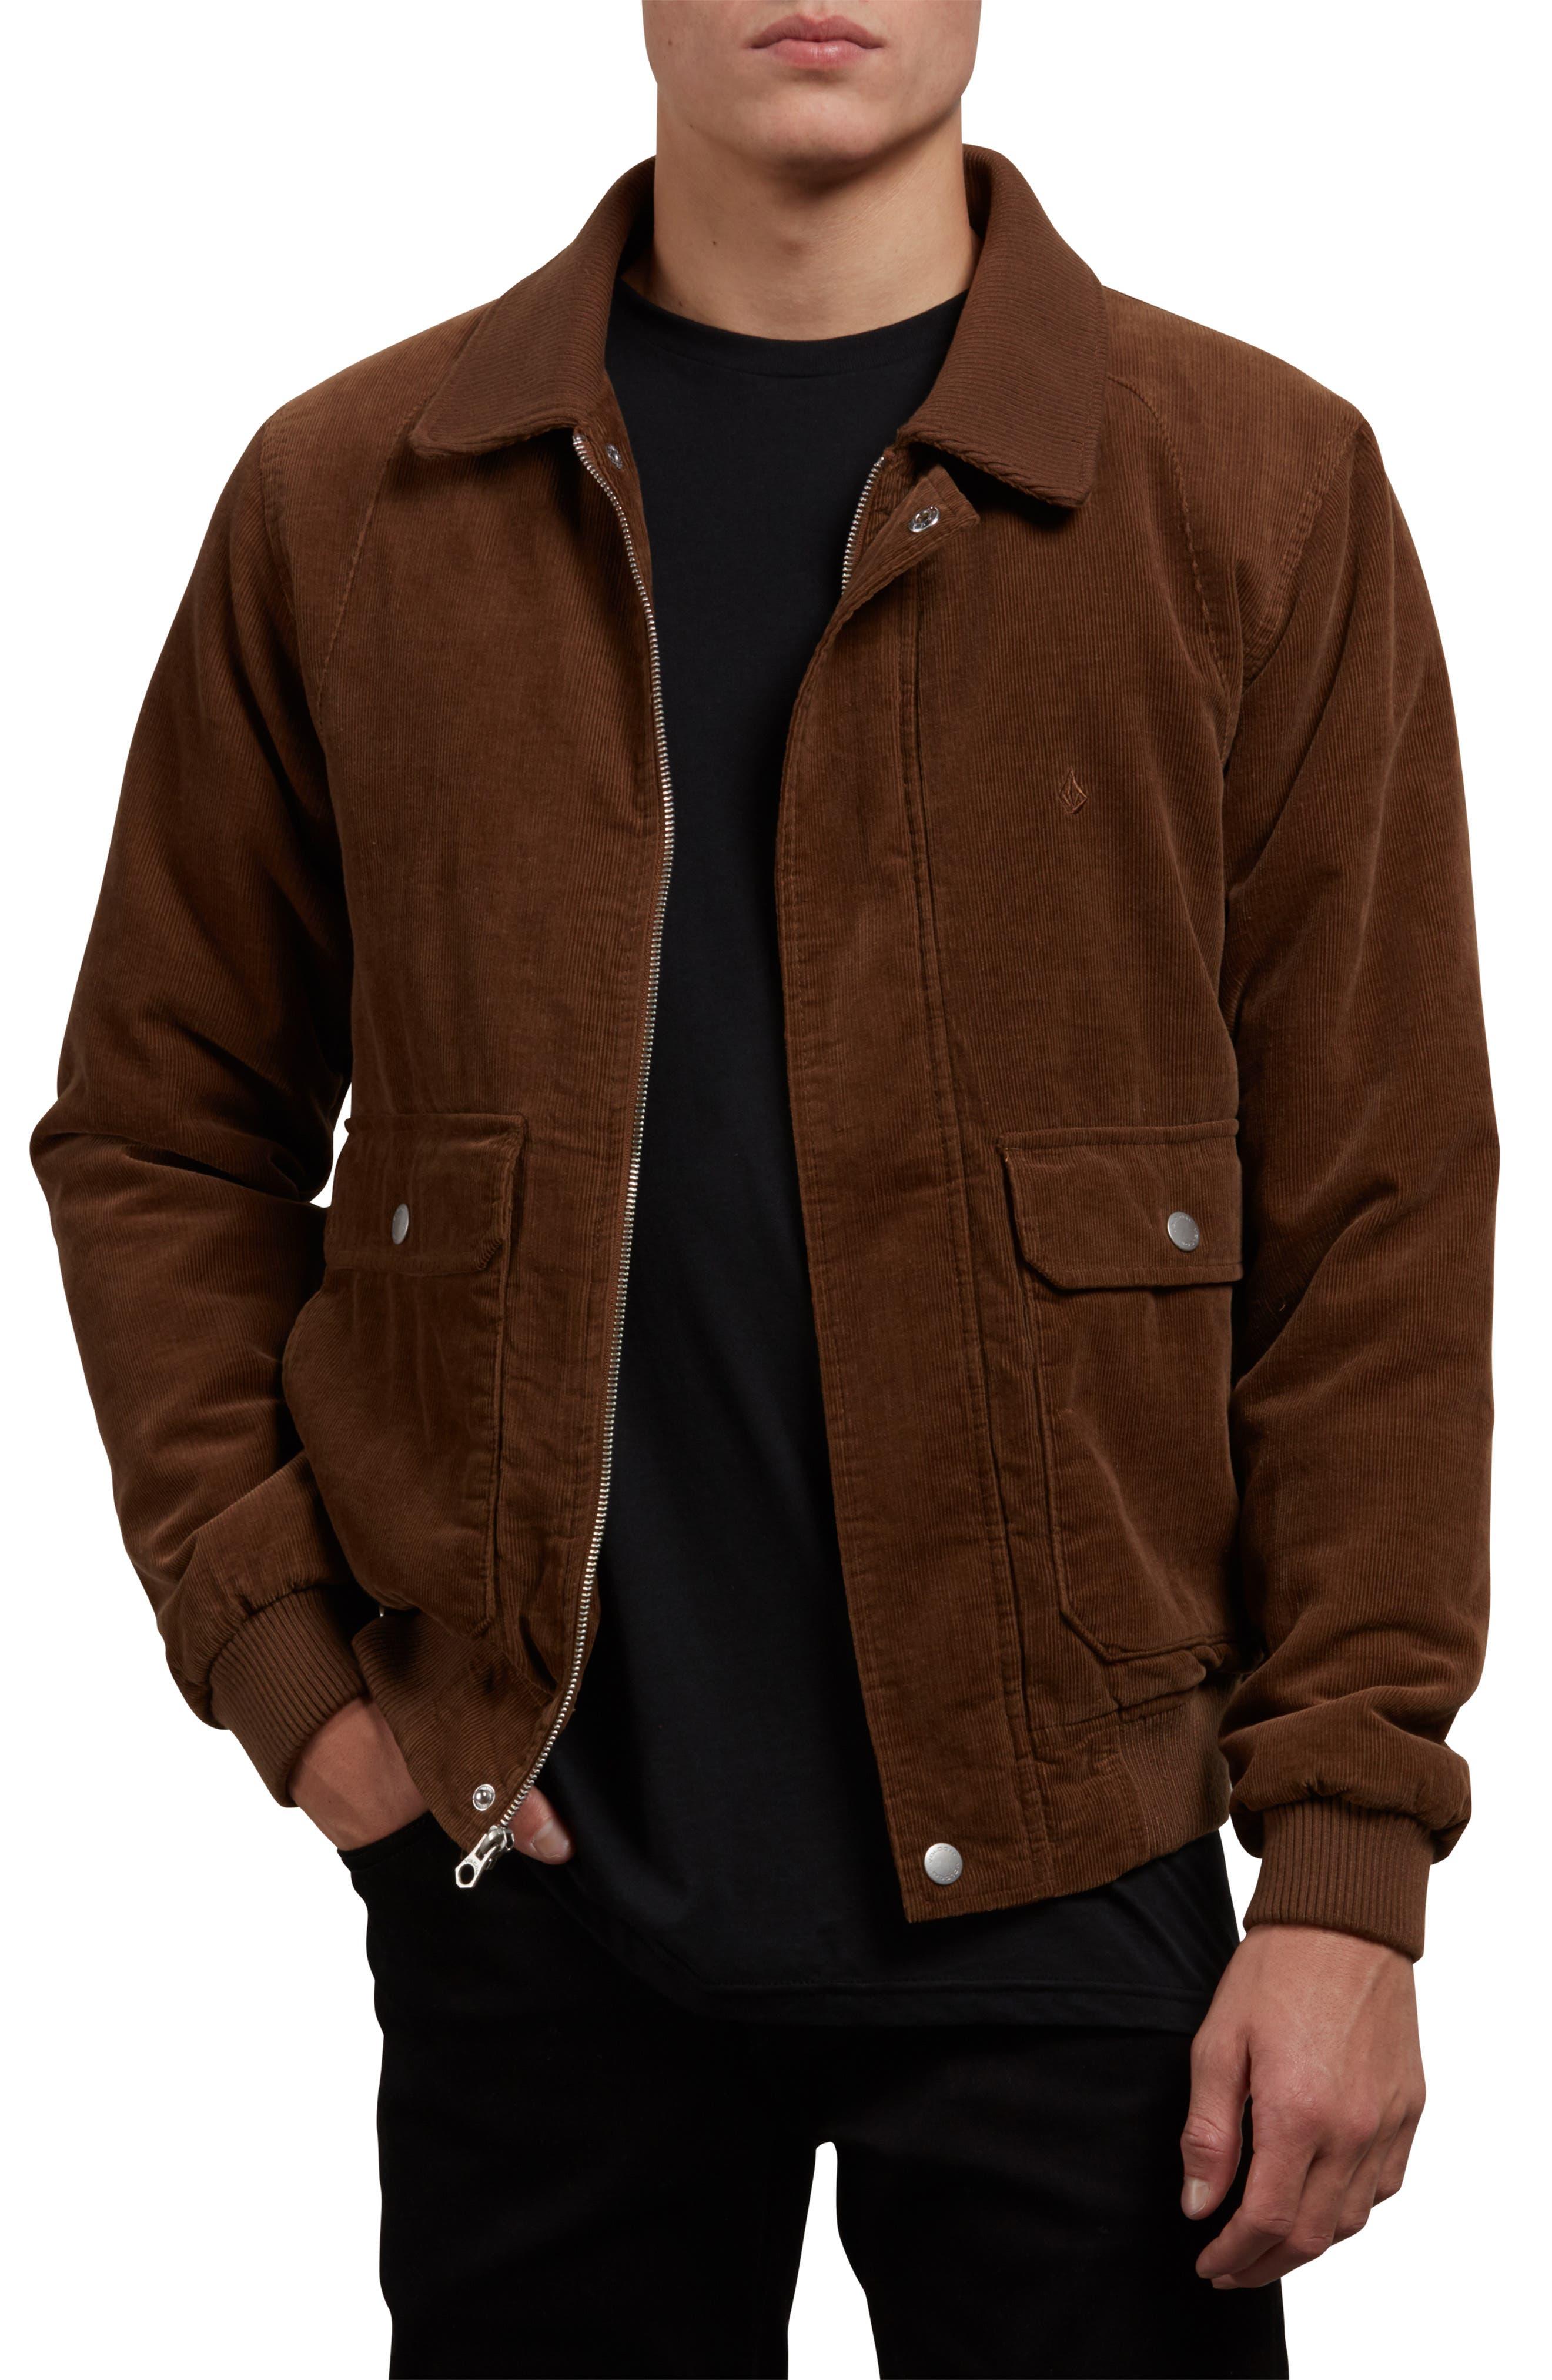 Domjohn Corduroy Jacket,                         Main,                         color, 248